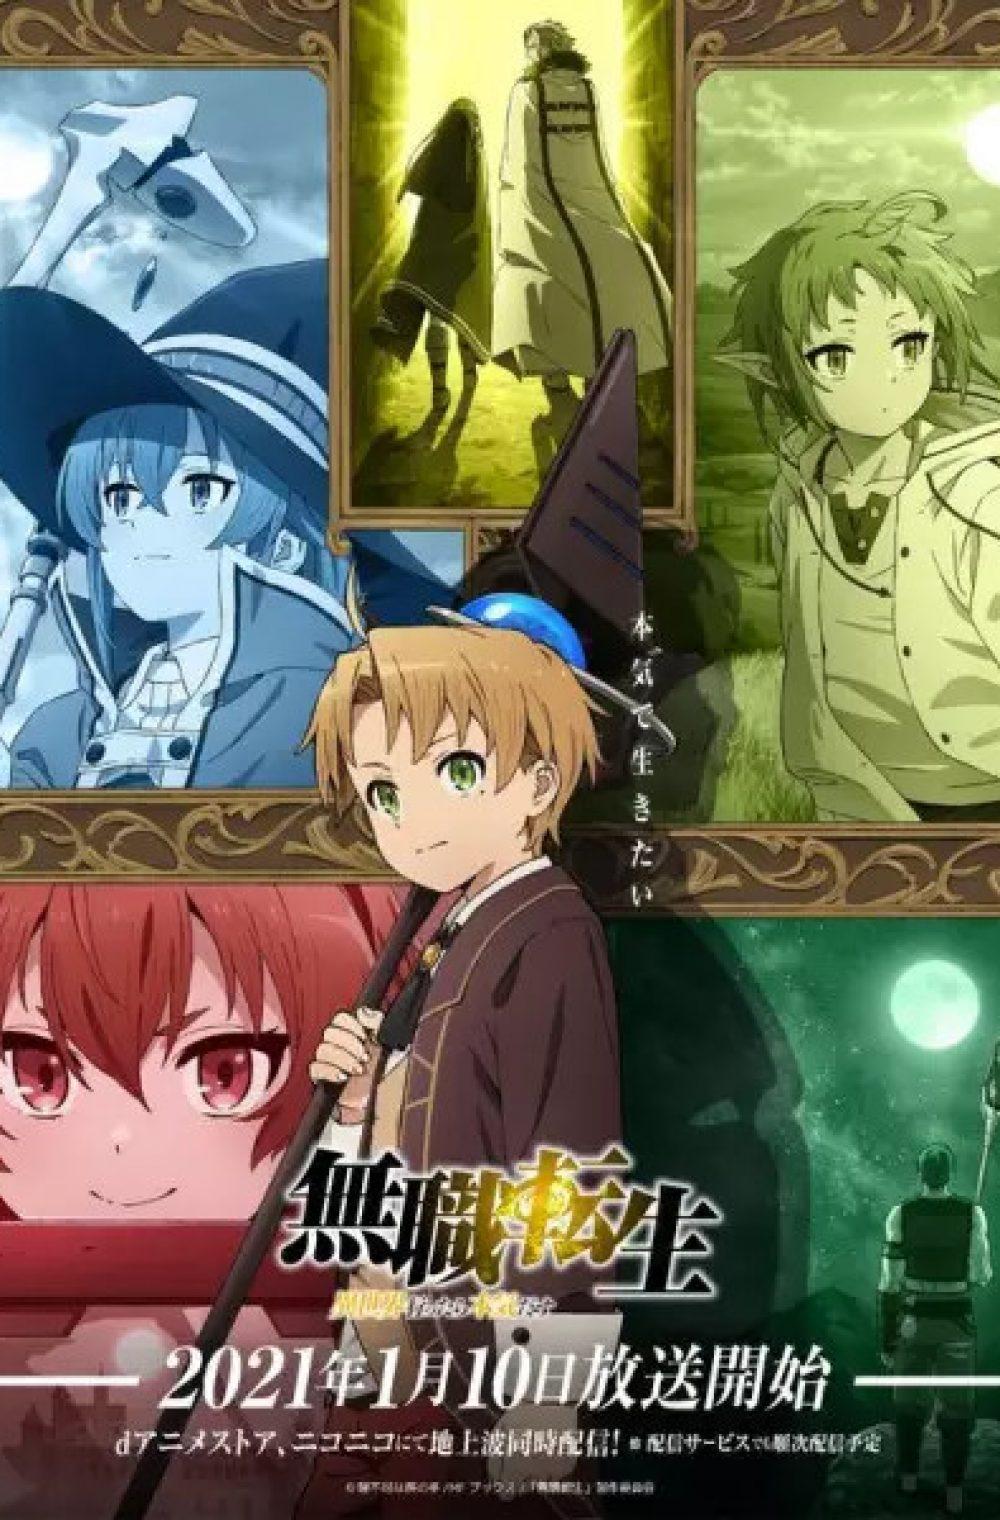 Mushoku Tensei: Isekai Ittara Honki Dasu – Jobless Reincarnation: I Will Seriously Try If I Go To Another World